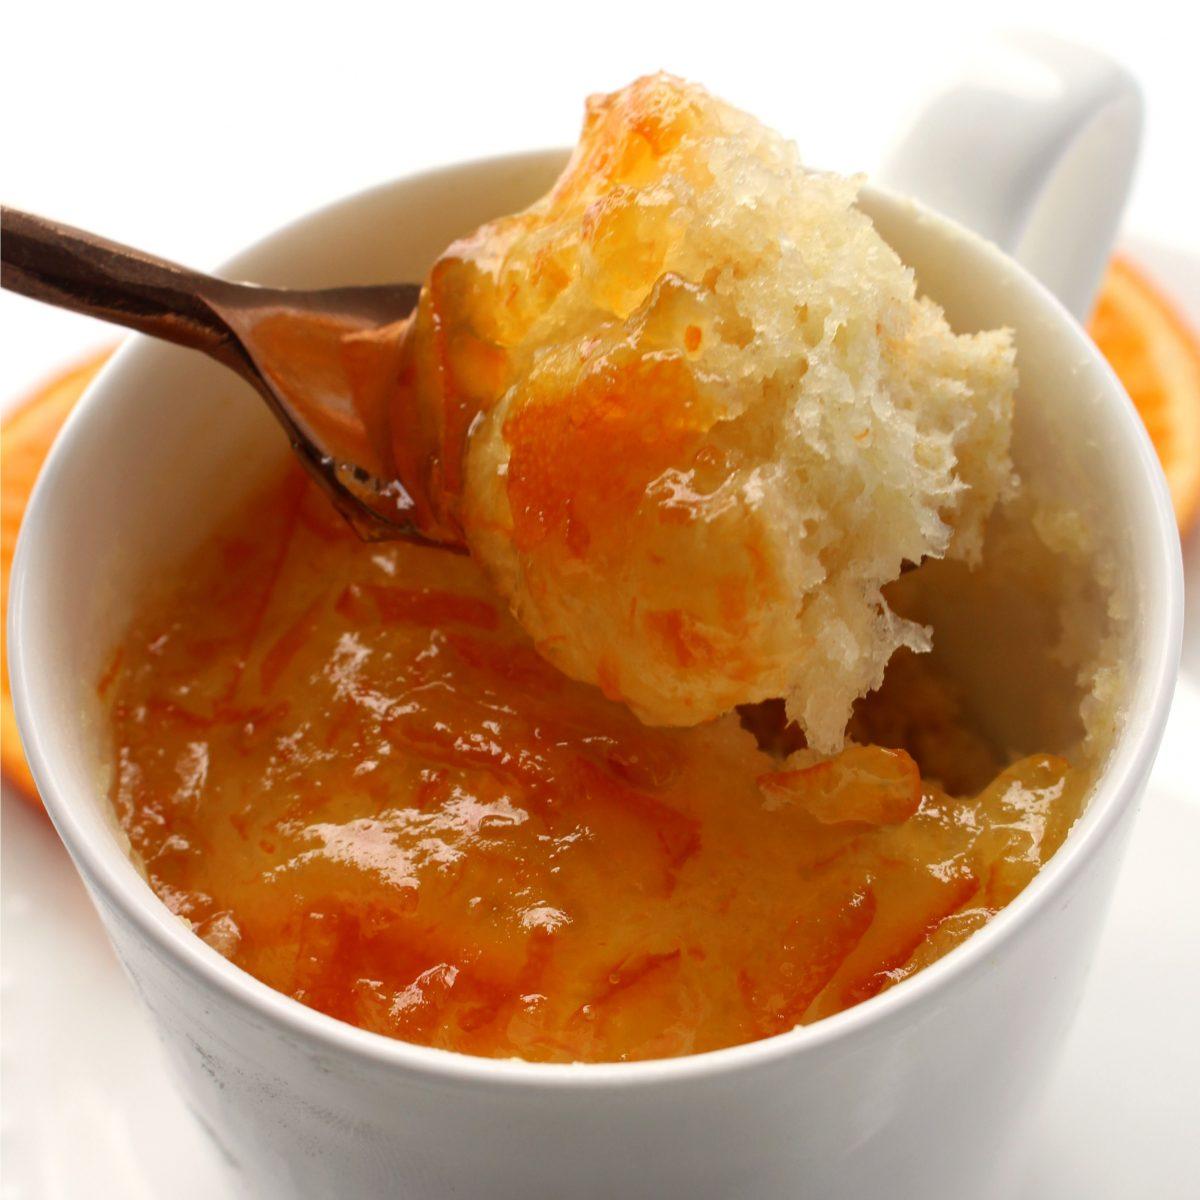 Close up marmalade topped mug cake with a piece of cake on a fork.